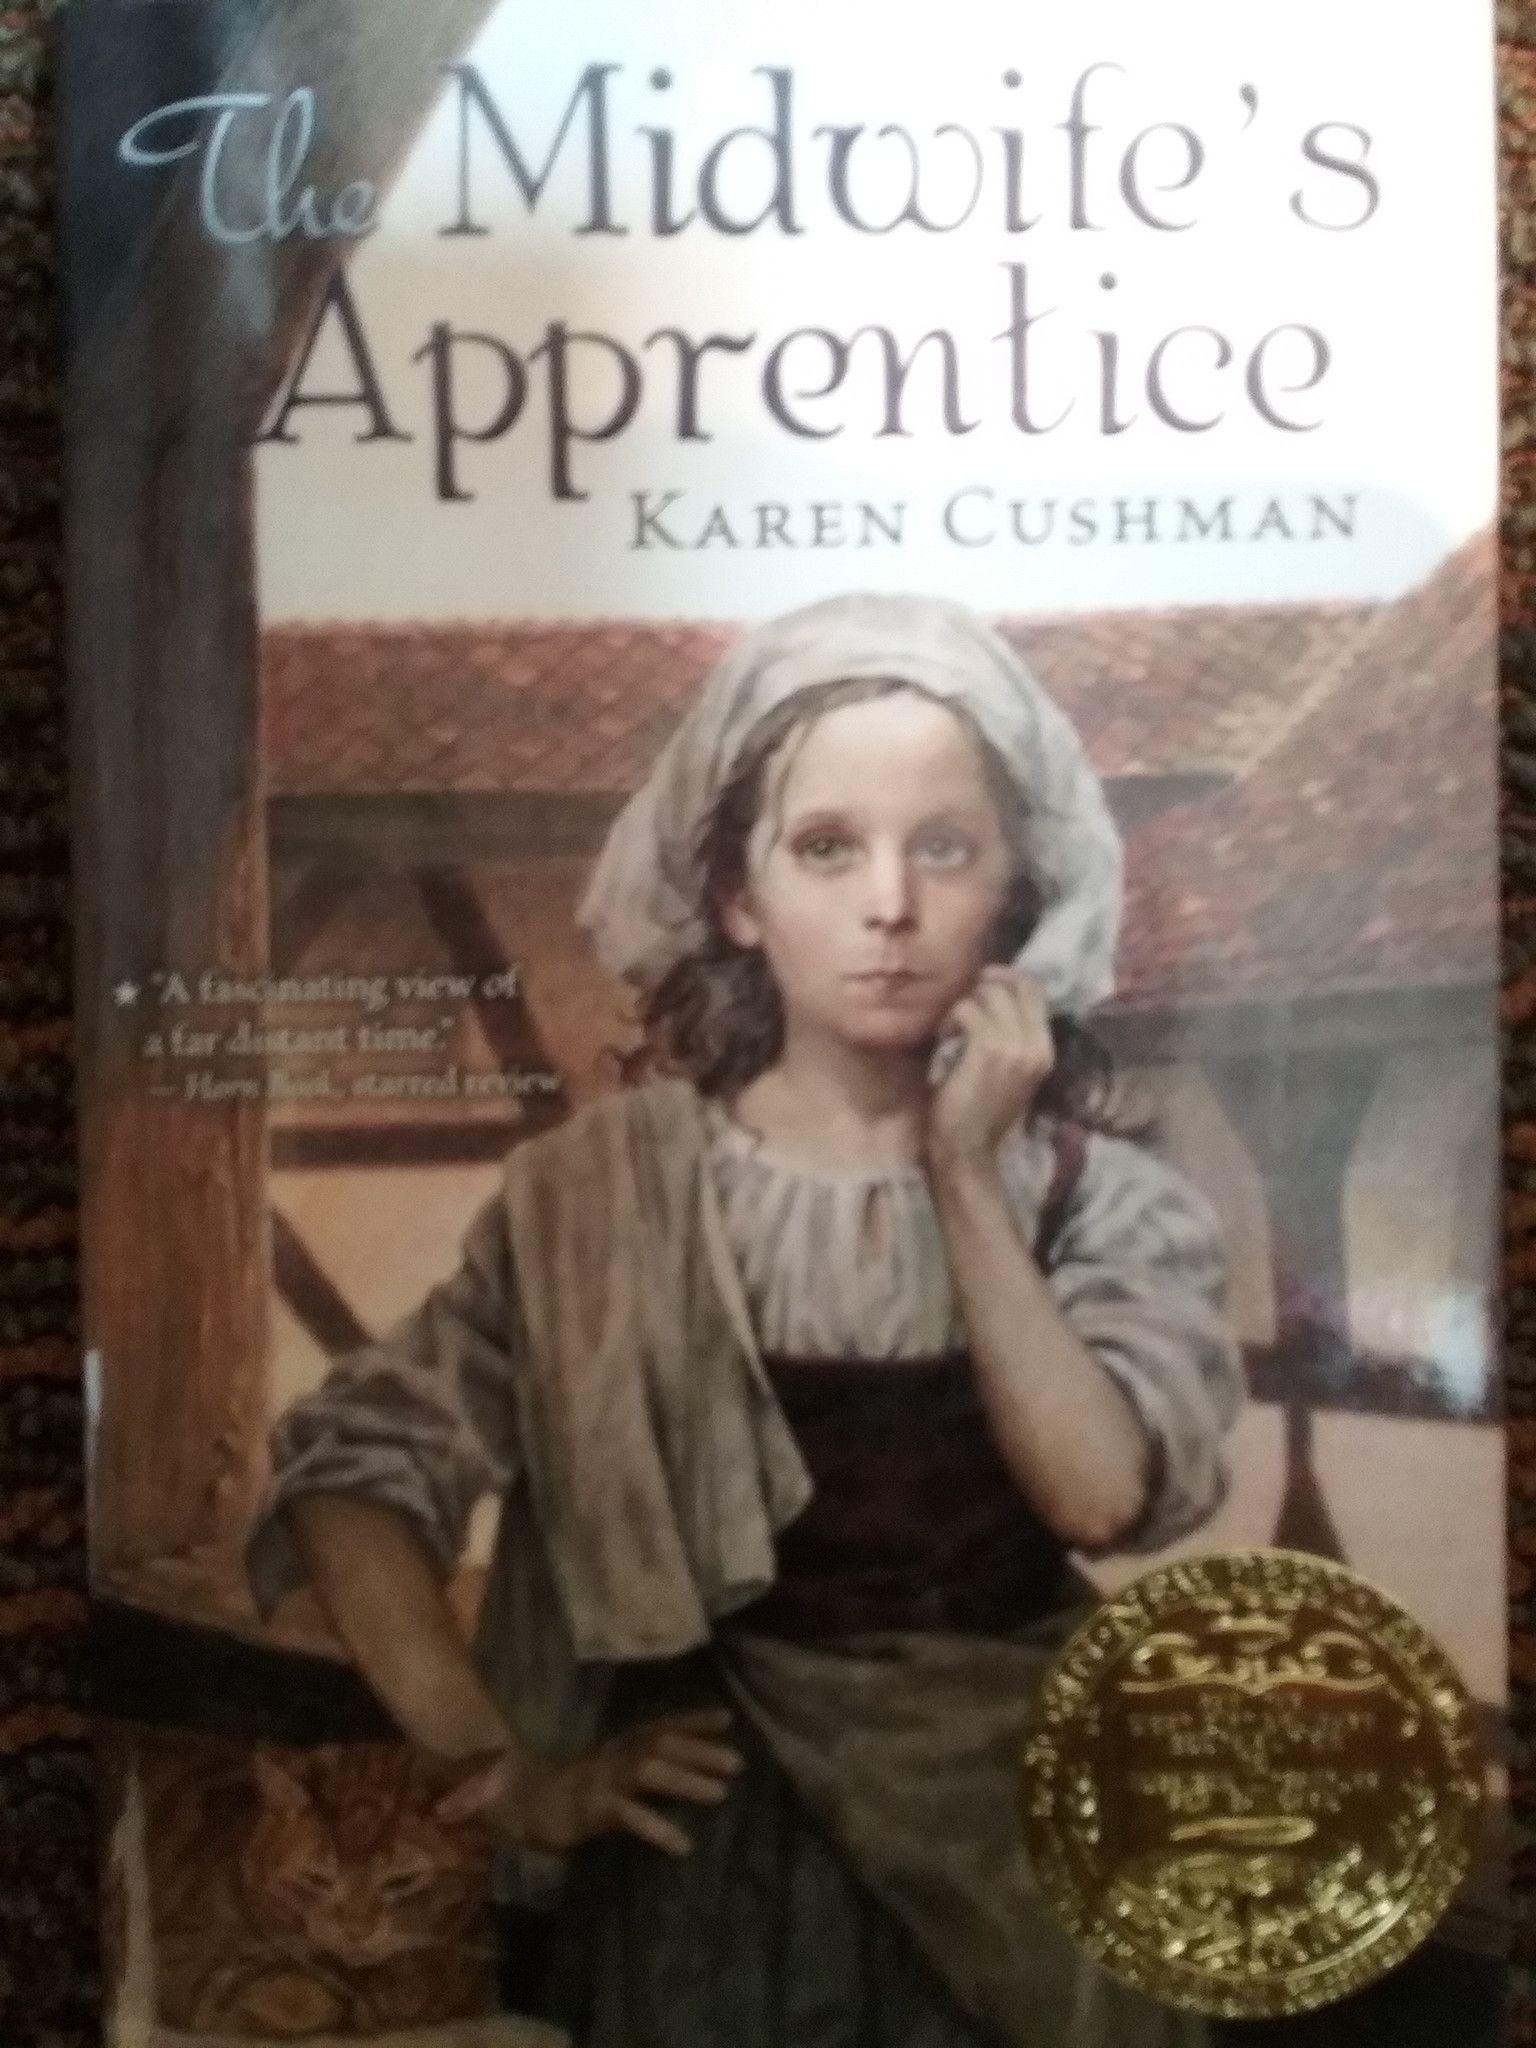 Midwife's Apprentice by Karen Cushman paperback The